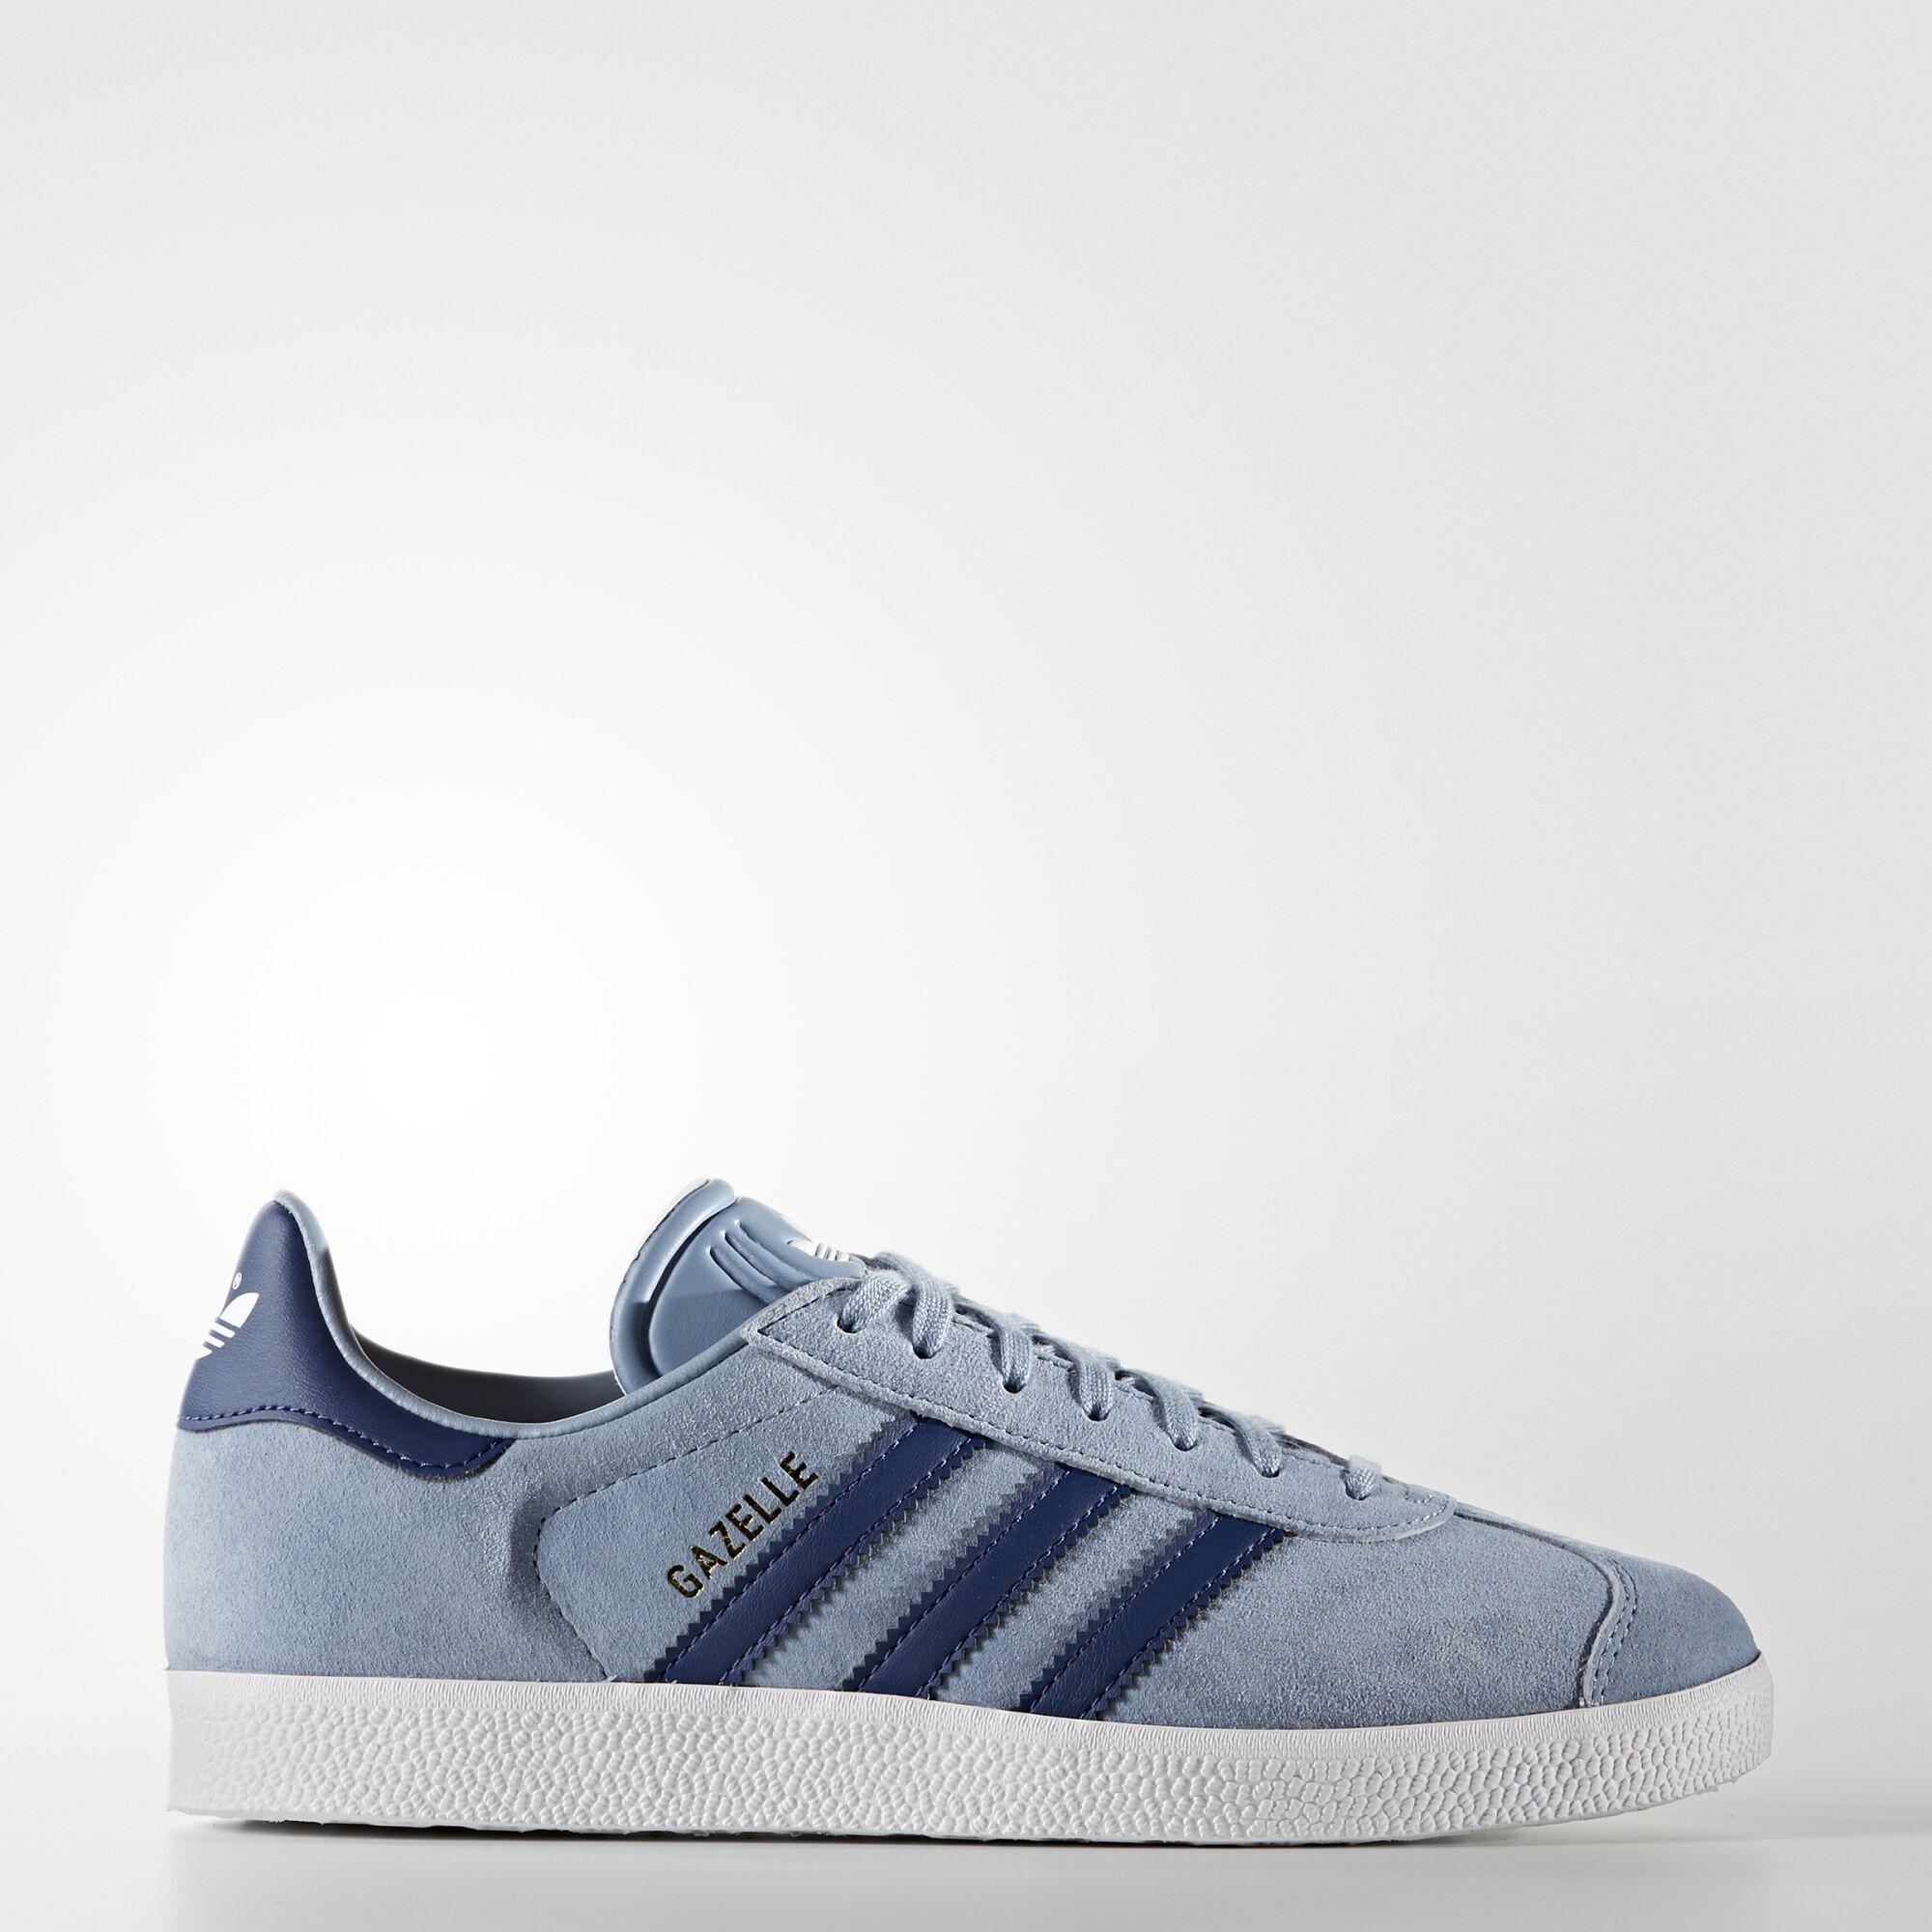 07a2445637a Buy adidas gazelle light blue   OFF62% Discounted